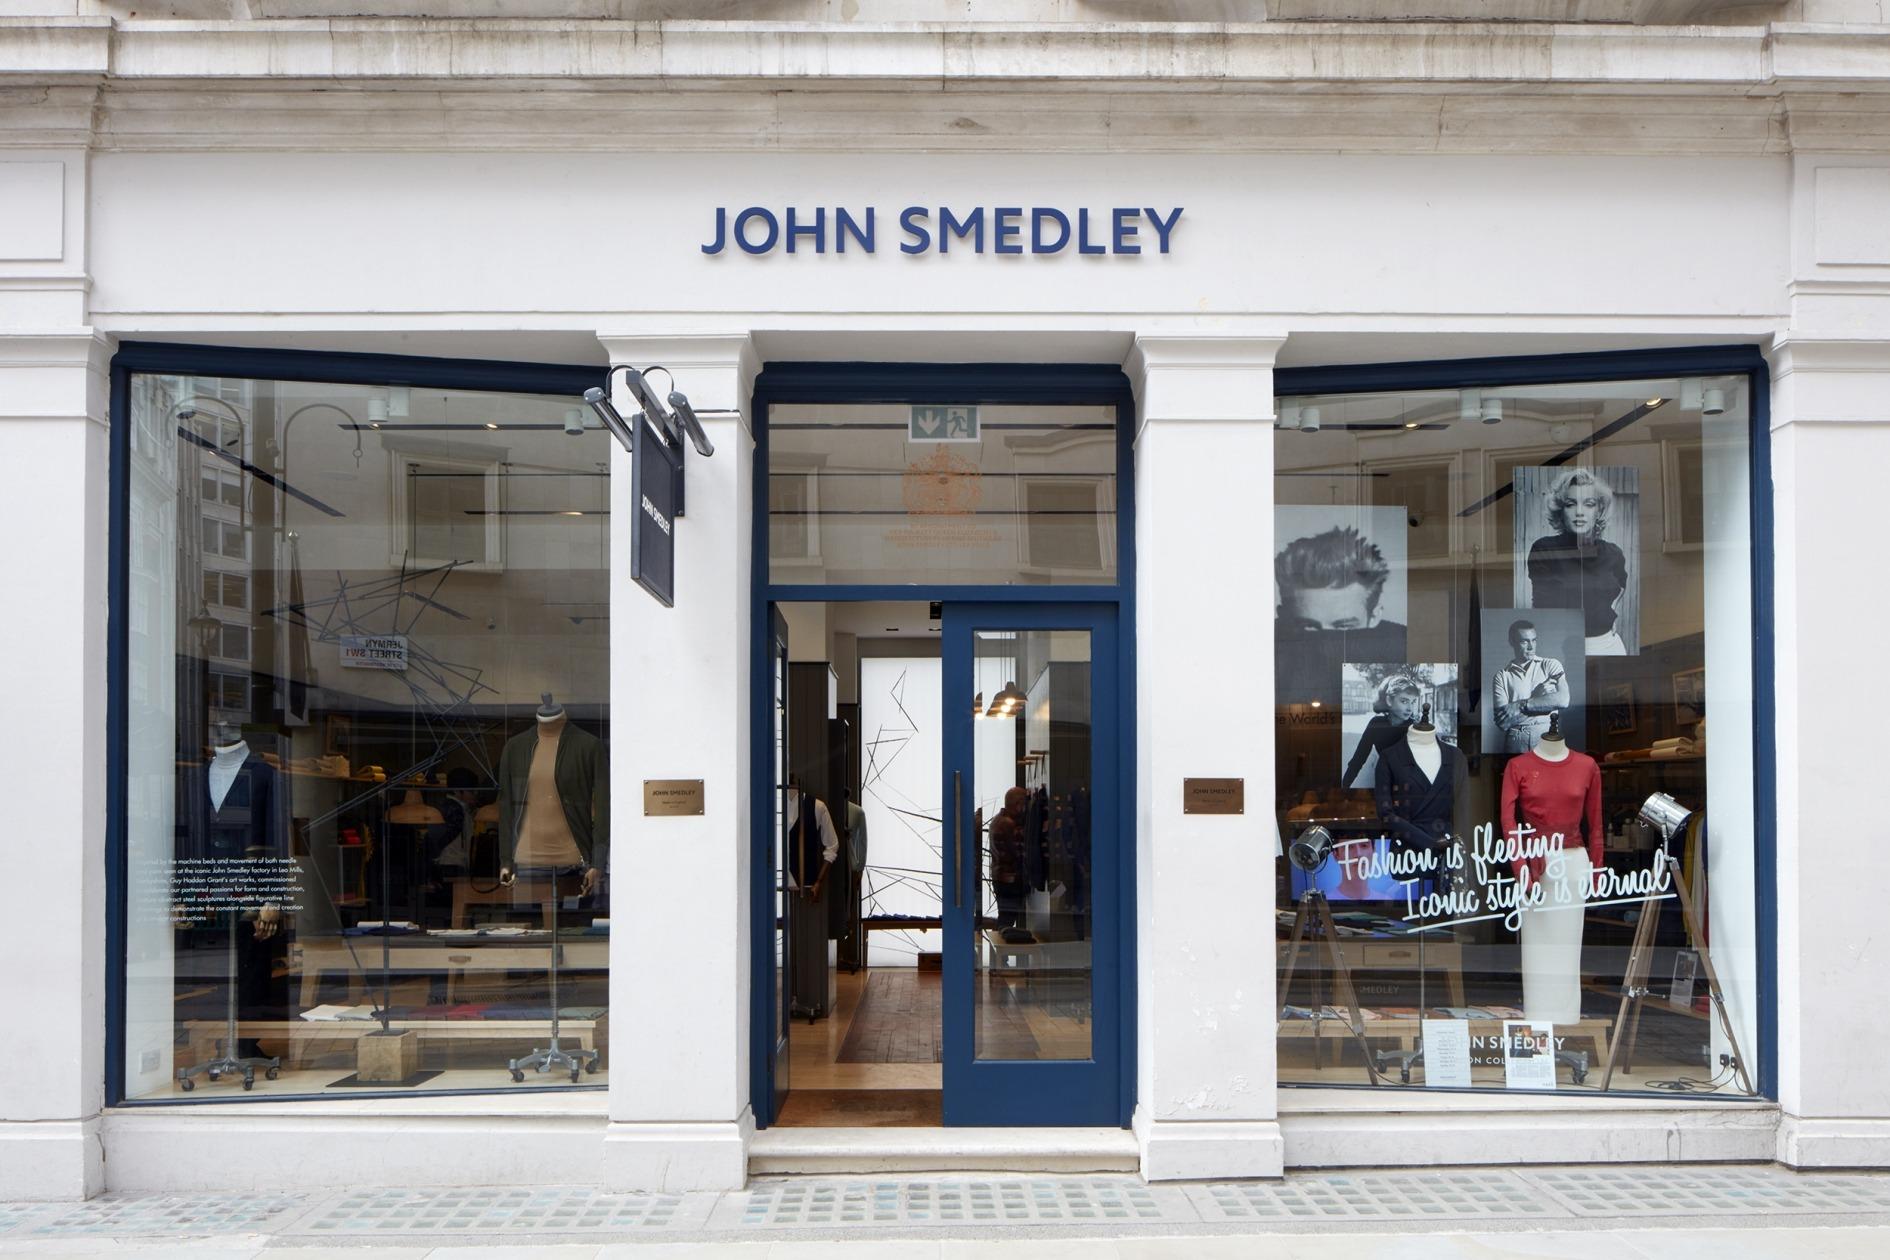 The John Smedley store on Jermyn Street